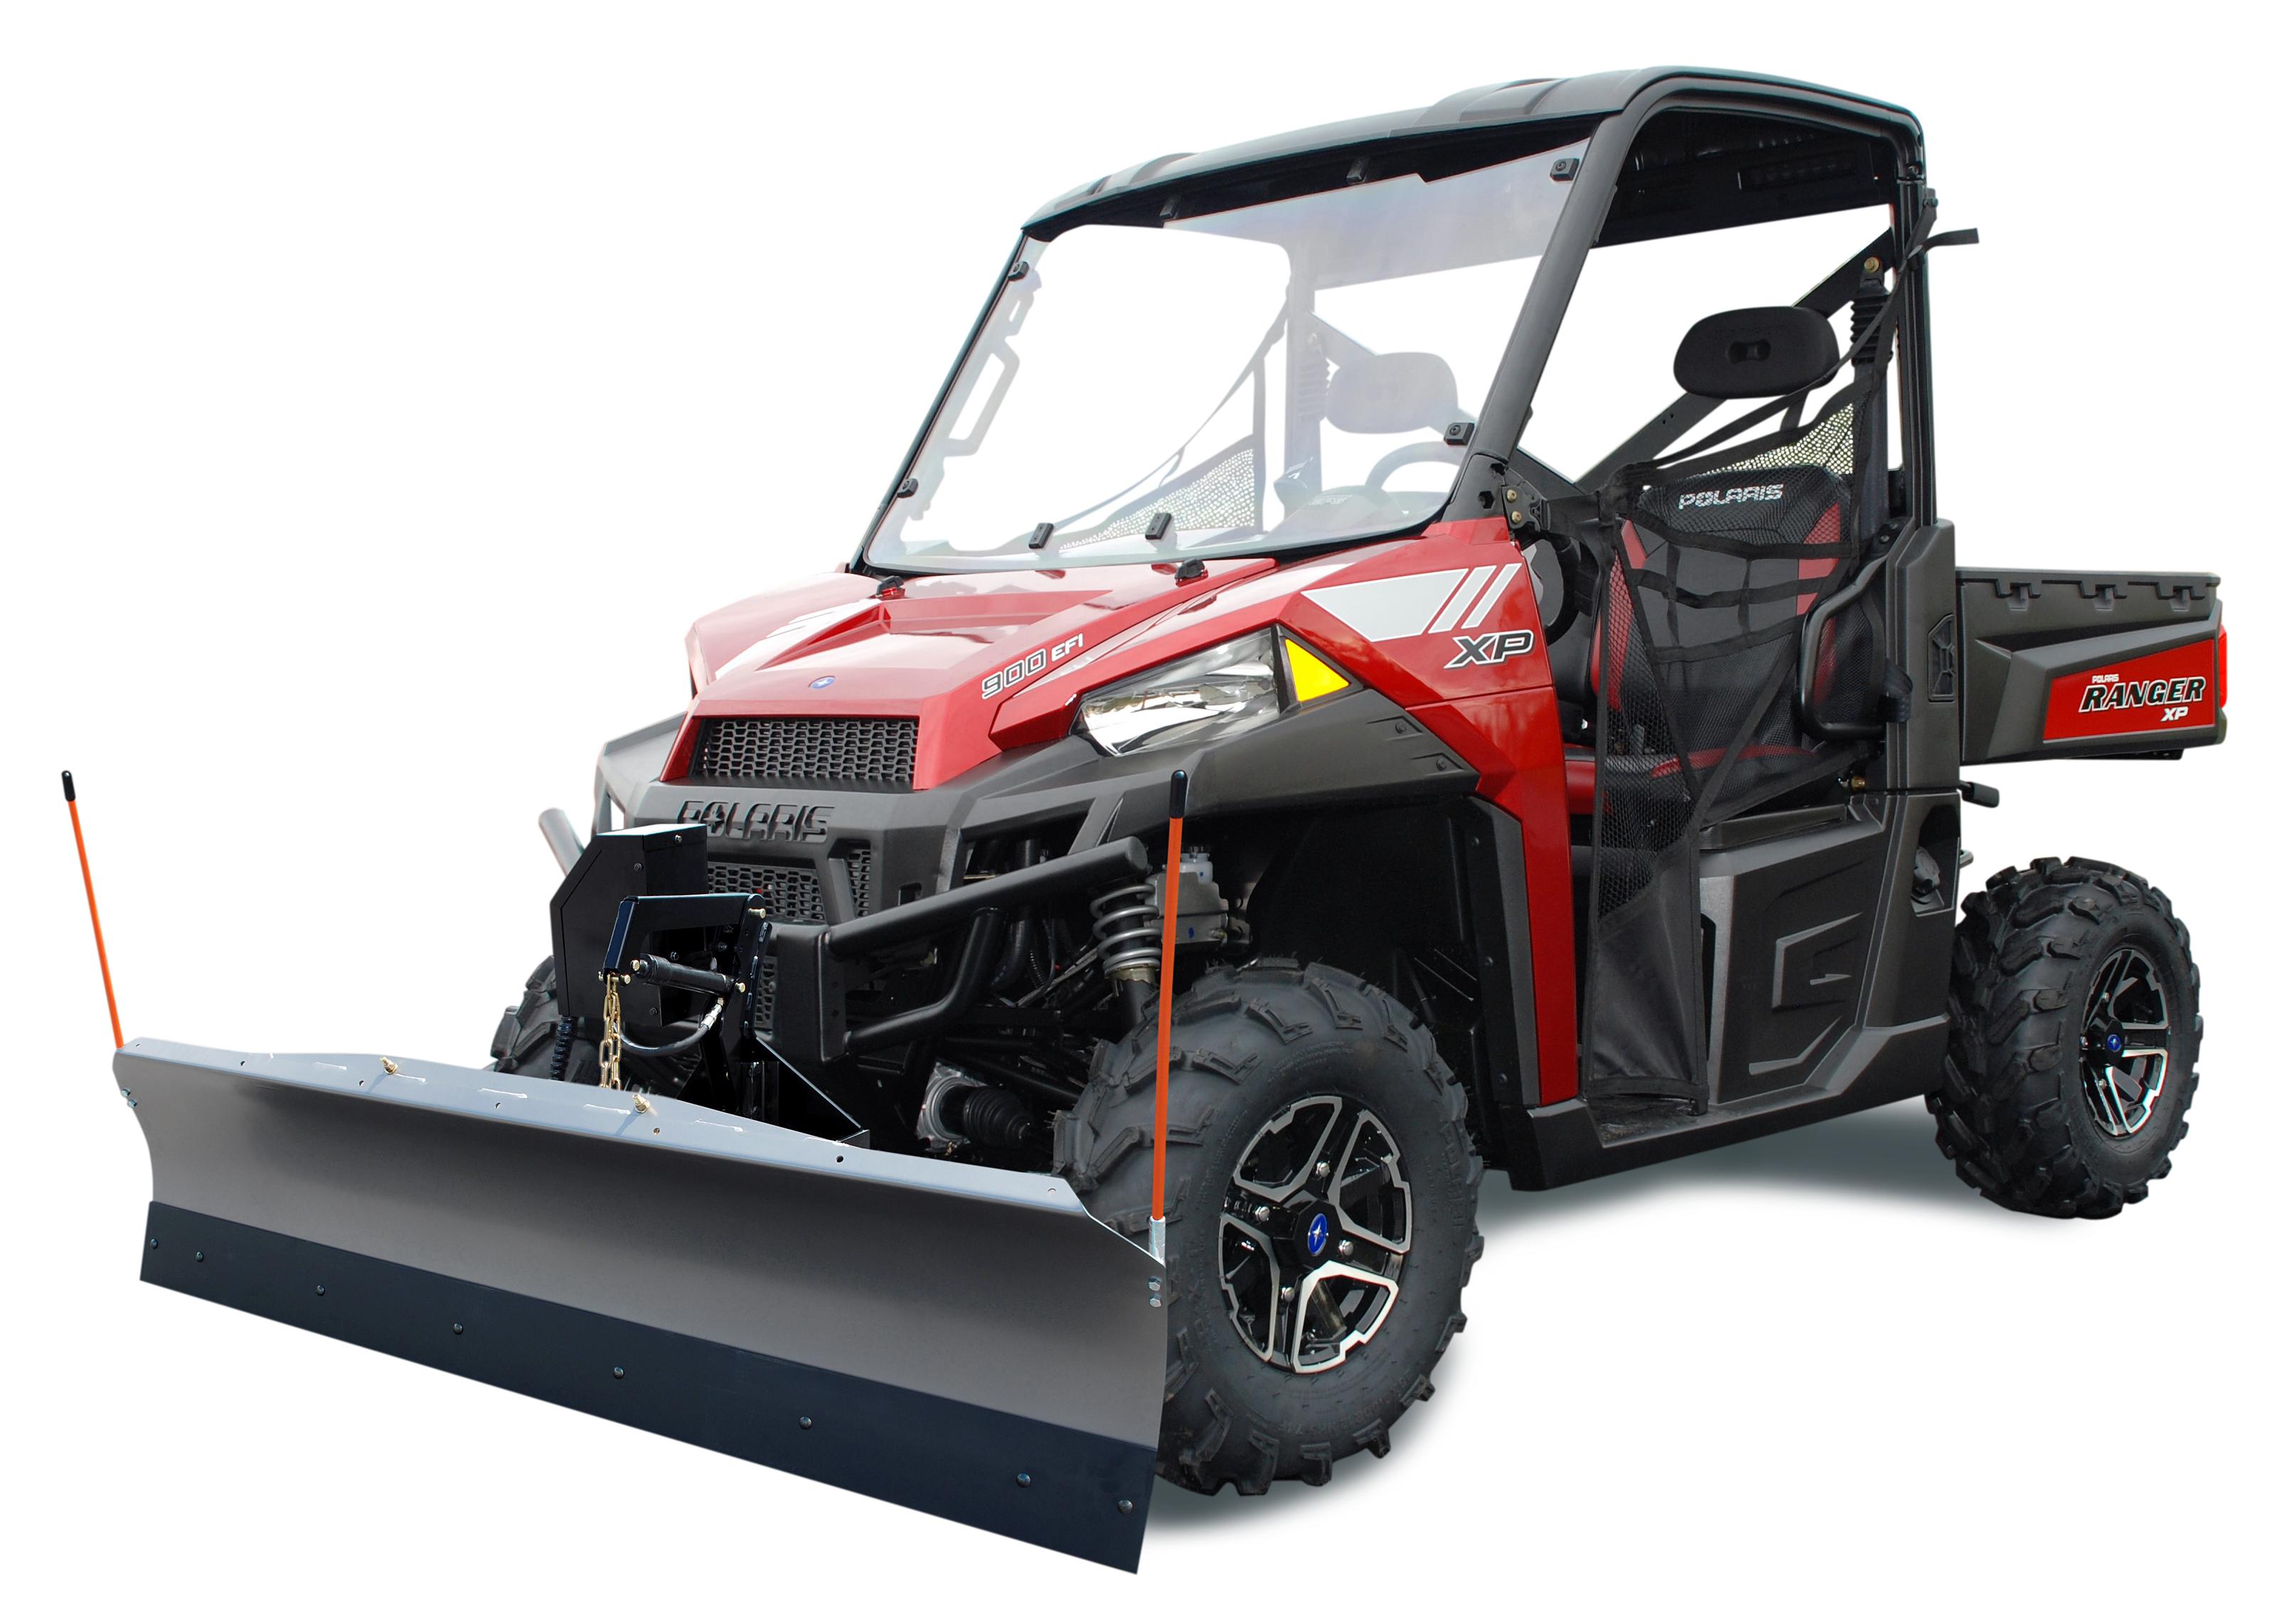 John Deere Xuv 550 Vs Polaris Ranger 500 >> Polaris Ranger 900 Xp Vs John Deere Gator 825i | Autos Post